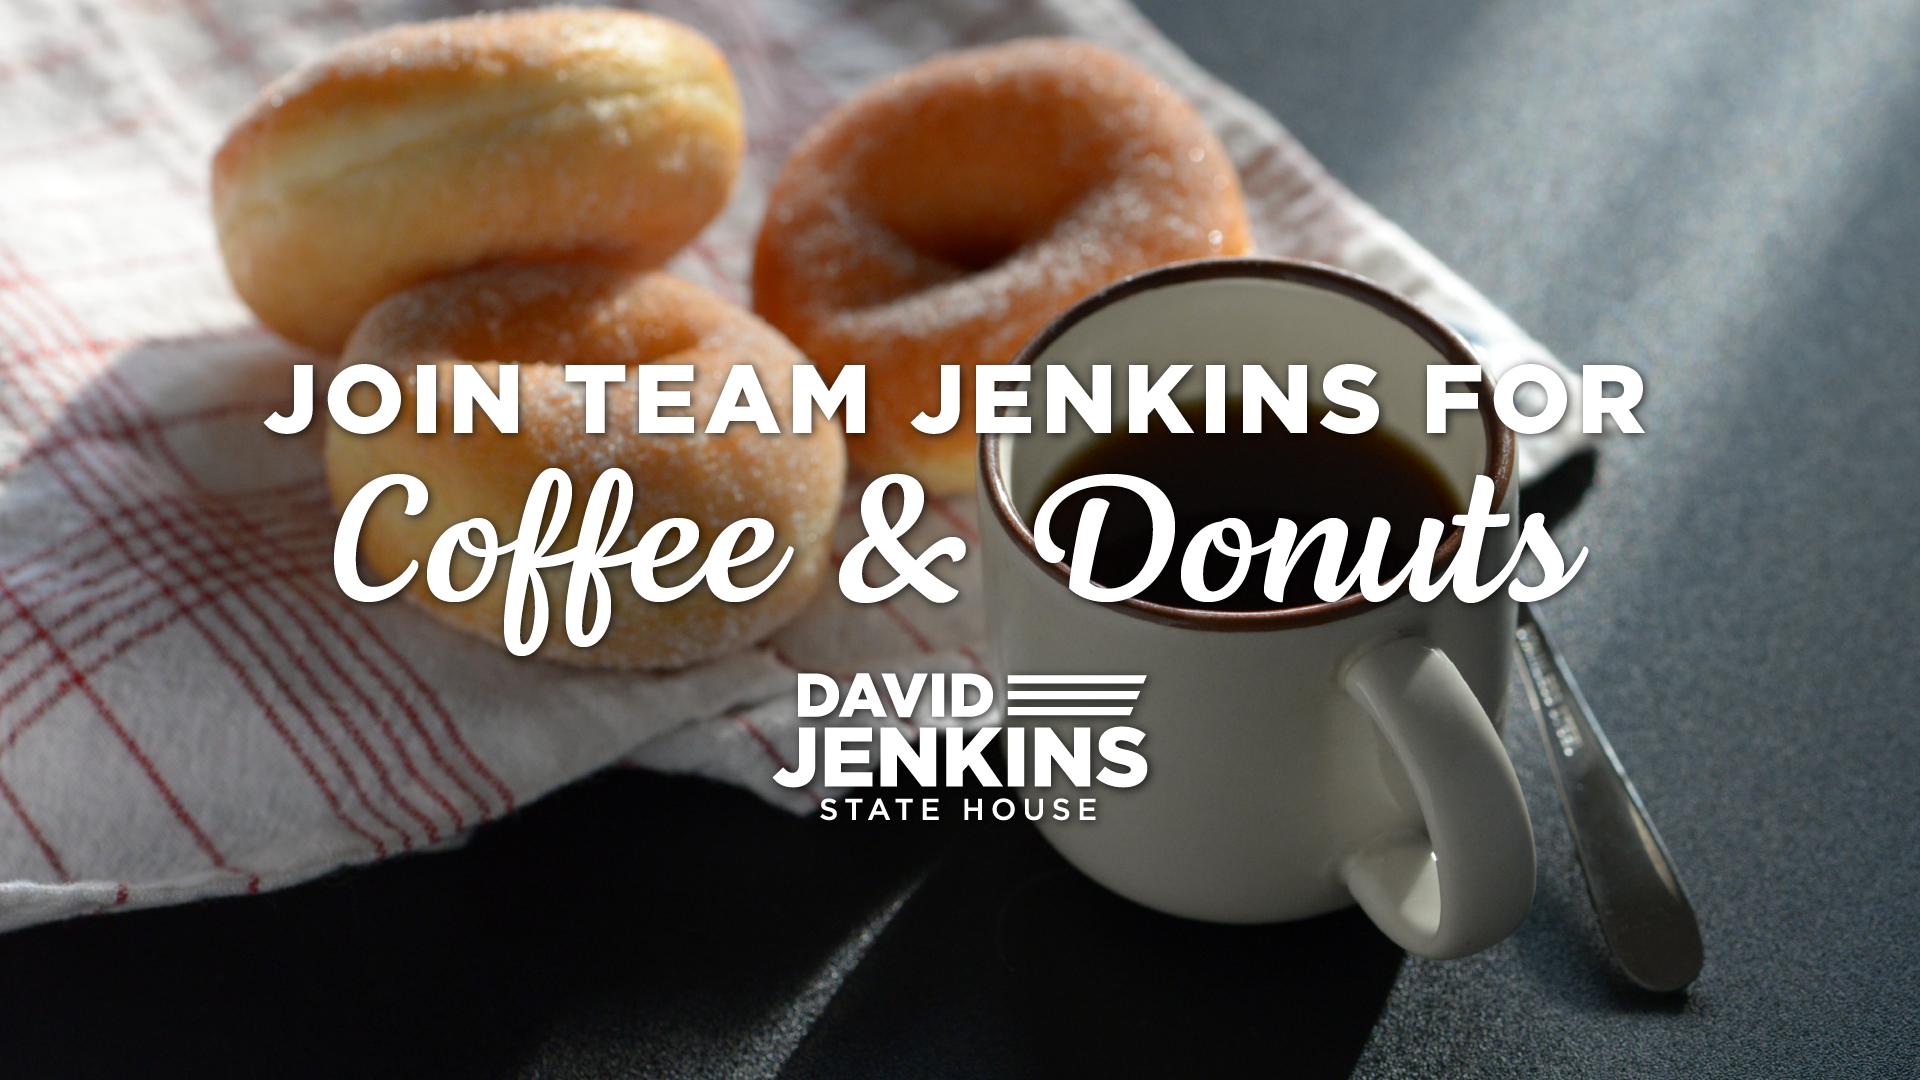 Meet & Greet with Team Jenkins